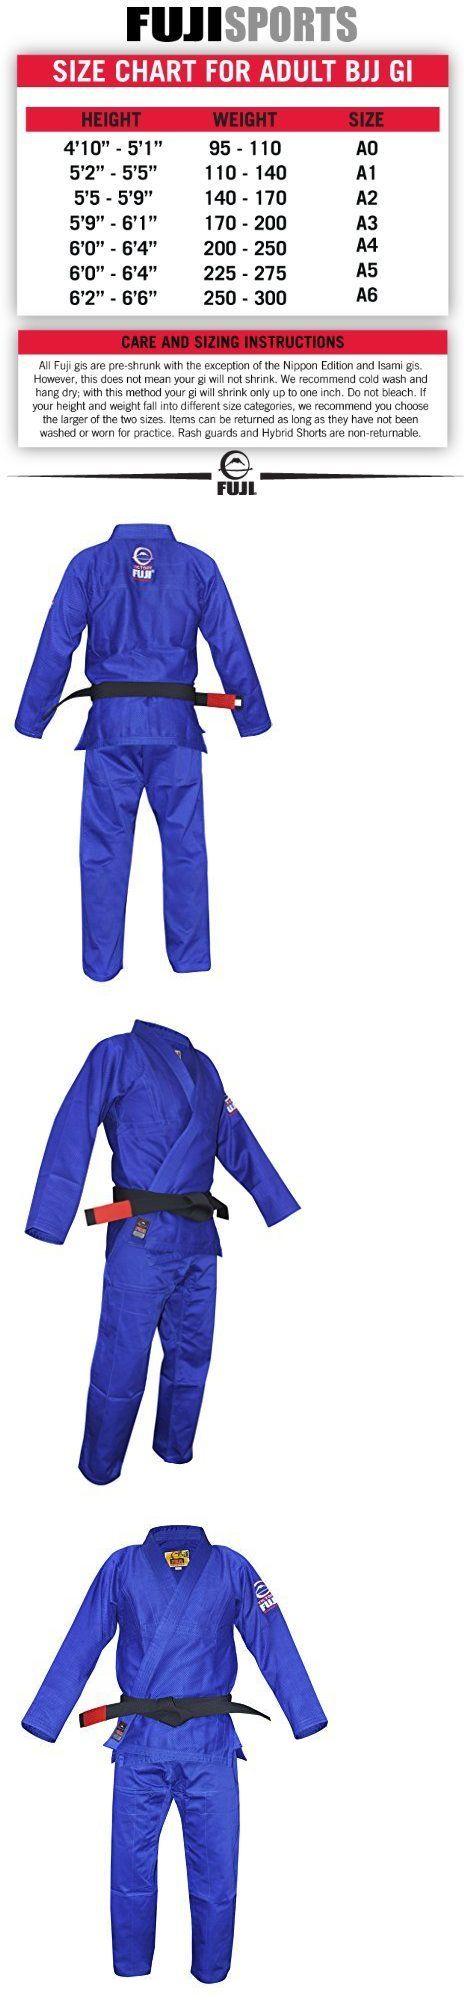 Jackets 179771: Fuji Bjj Uniform Blue A1 Mens Martial Arts Uniform Jacket, New -> BUY IT NOW ONLY: $108.77 on eBay!